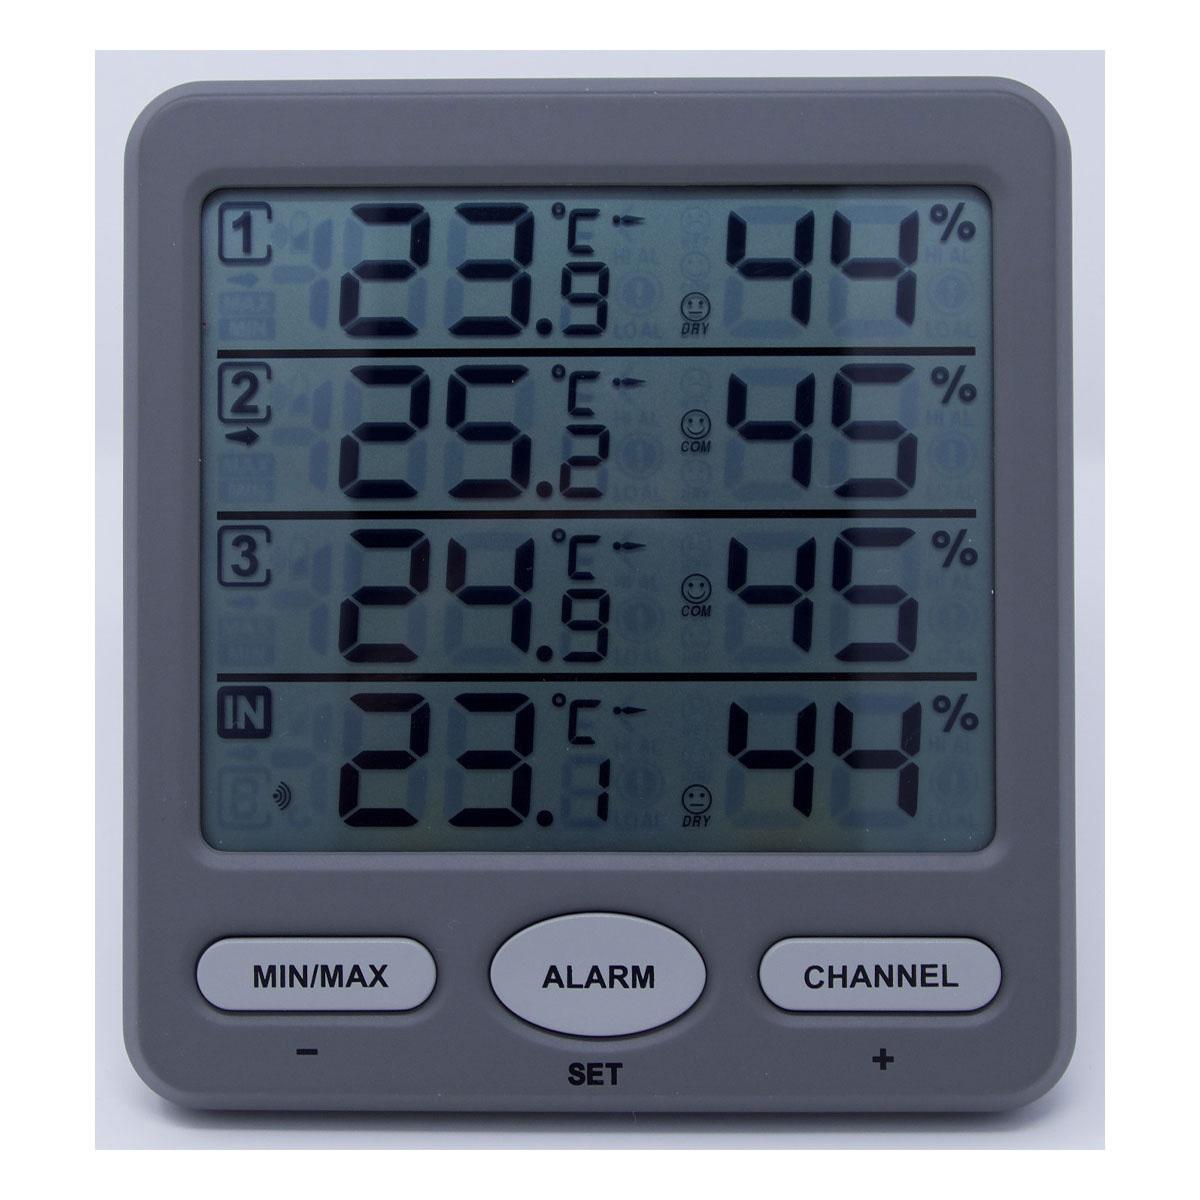 30-3054-10-funk-thermo-hygrometer-mit-3-sendern-klima-monitor-beleuchtung-1200x1020px.jpg